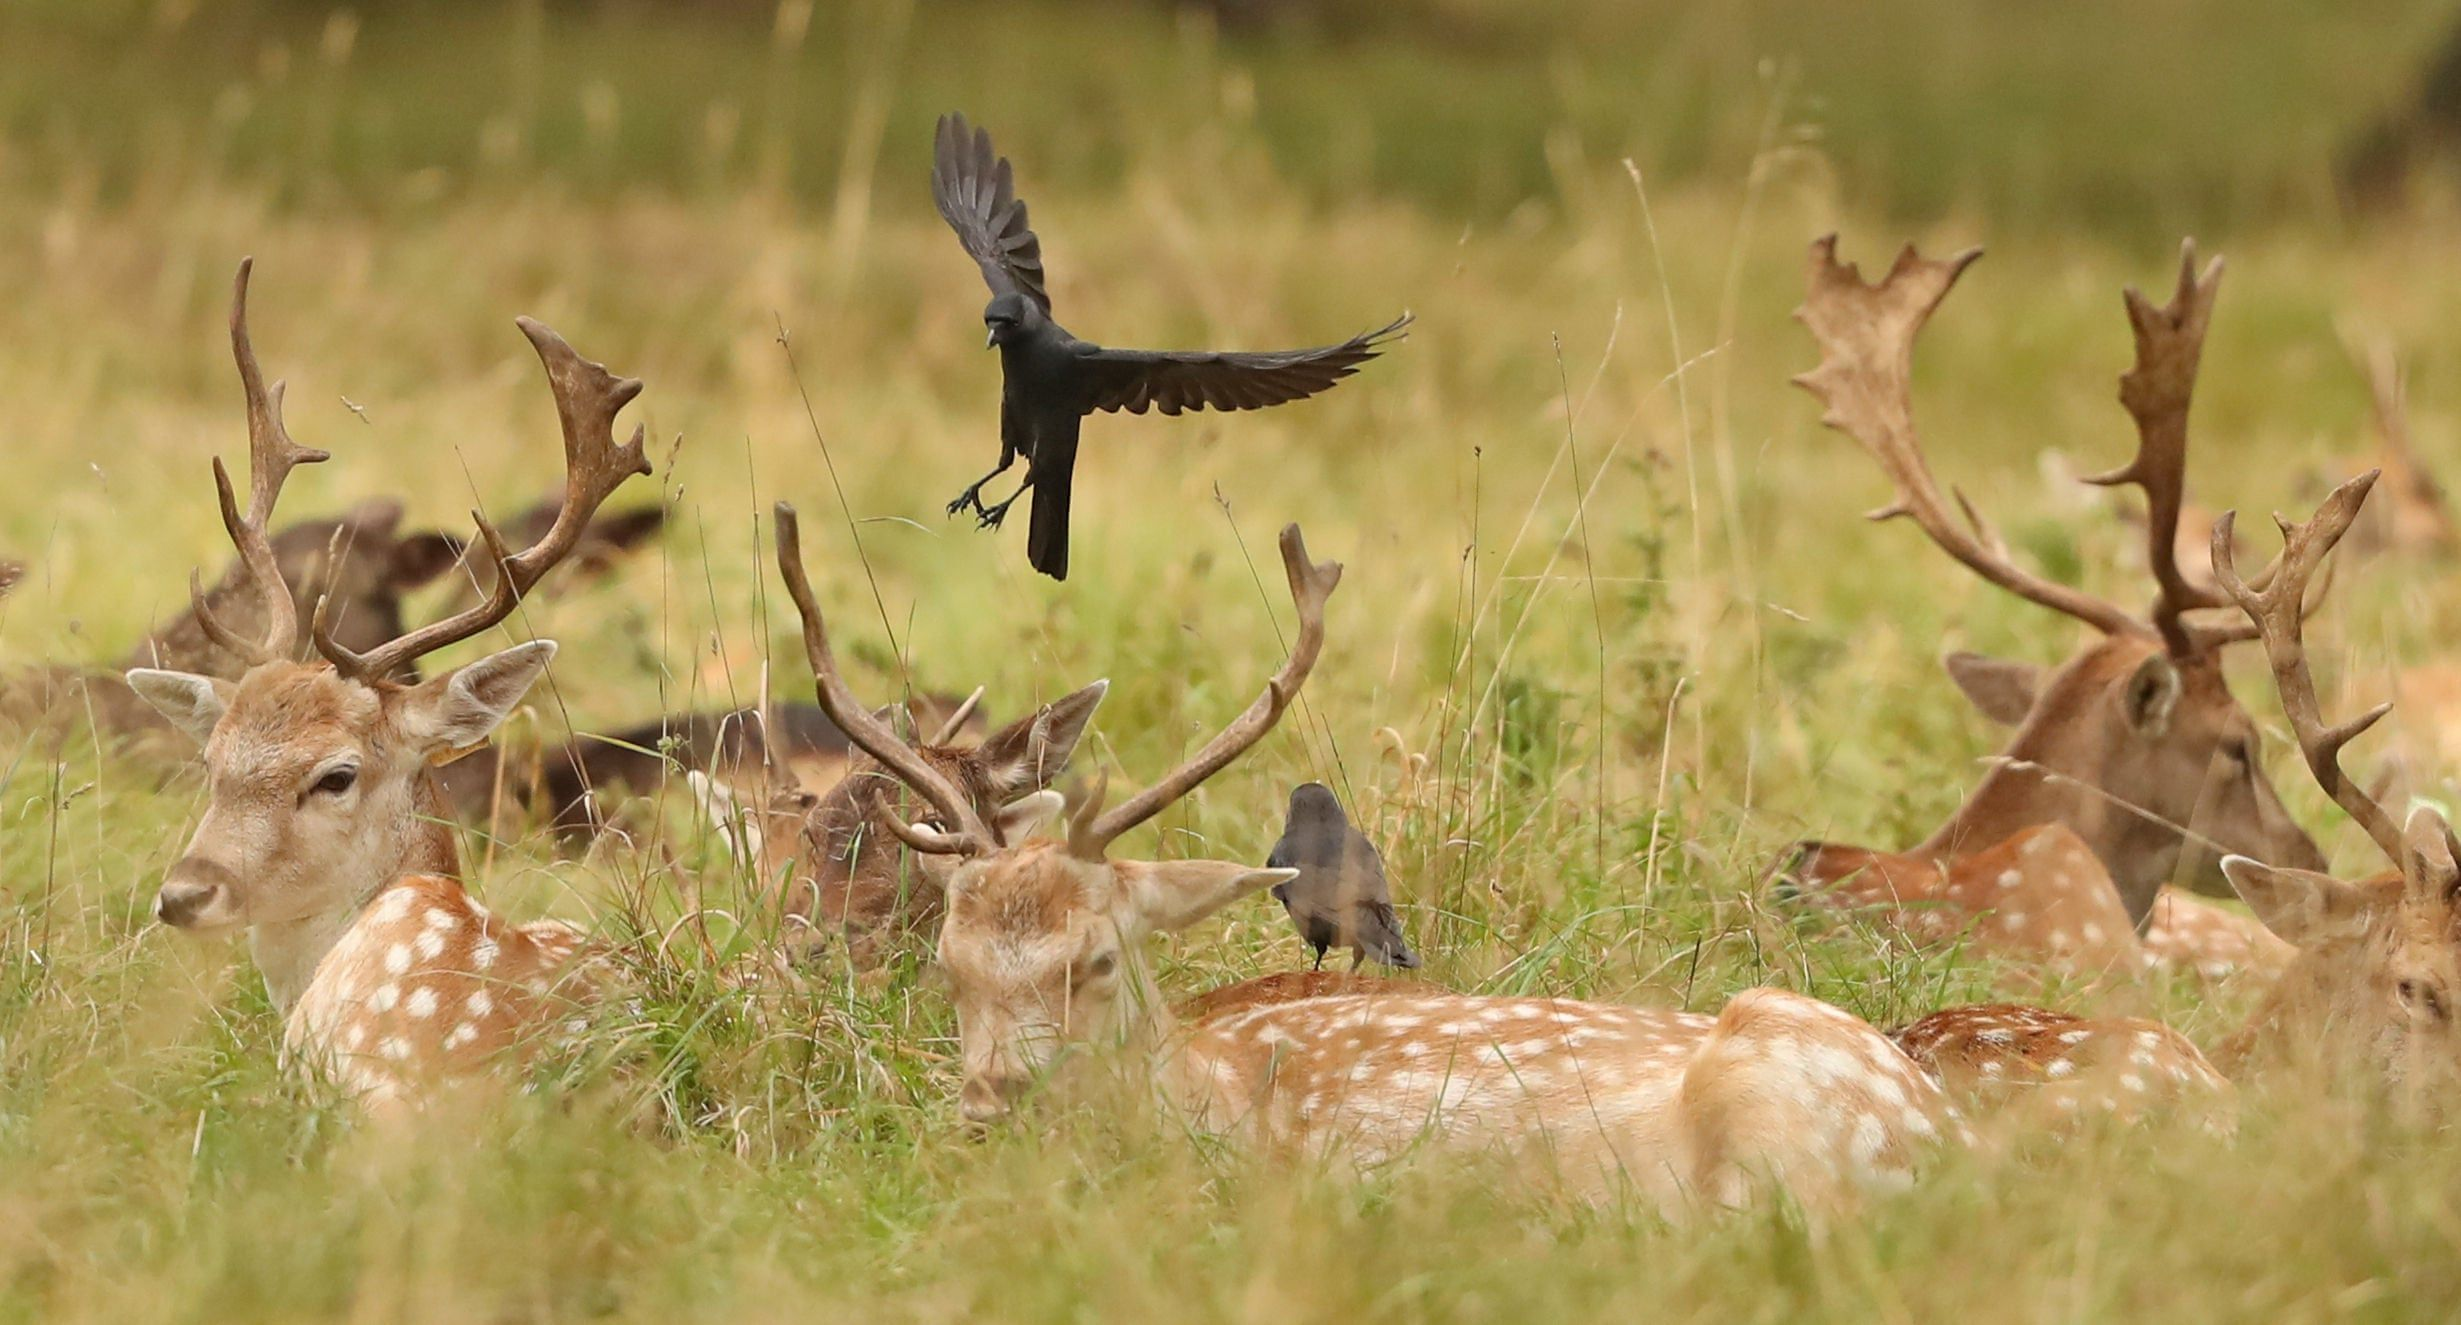 The week in wildlife in pictures wildlife animals